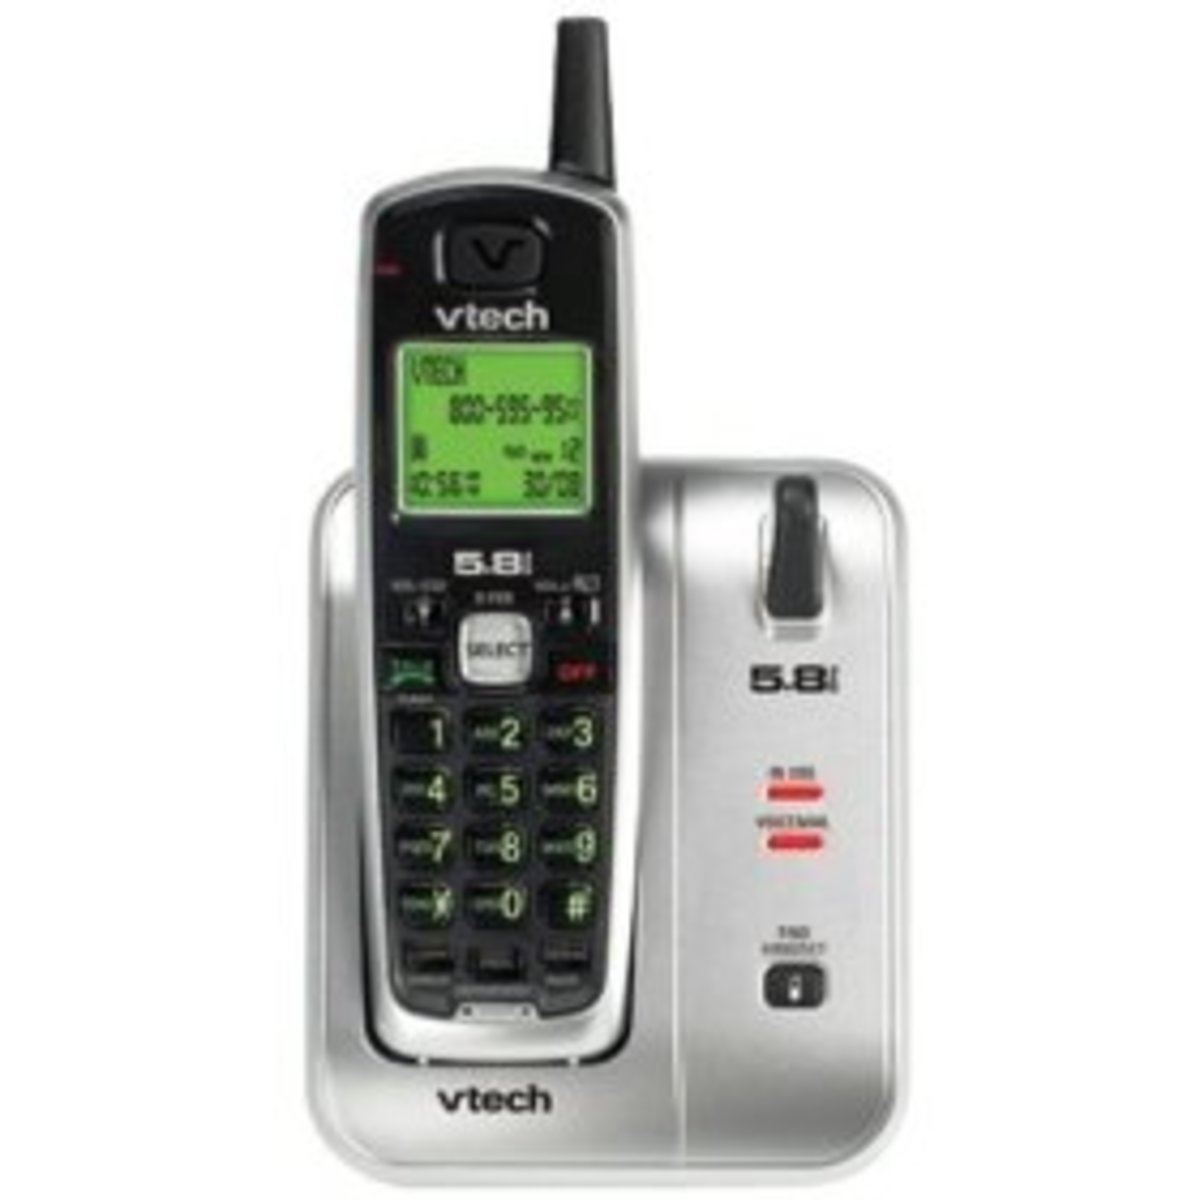 -Tech CS5111 5.8GHz Cordless Phone